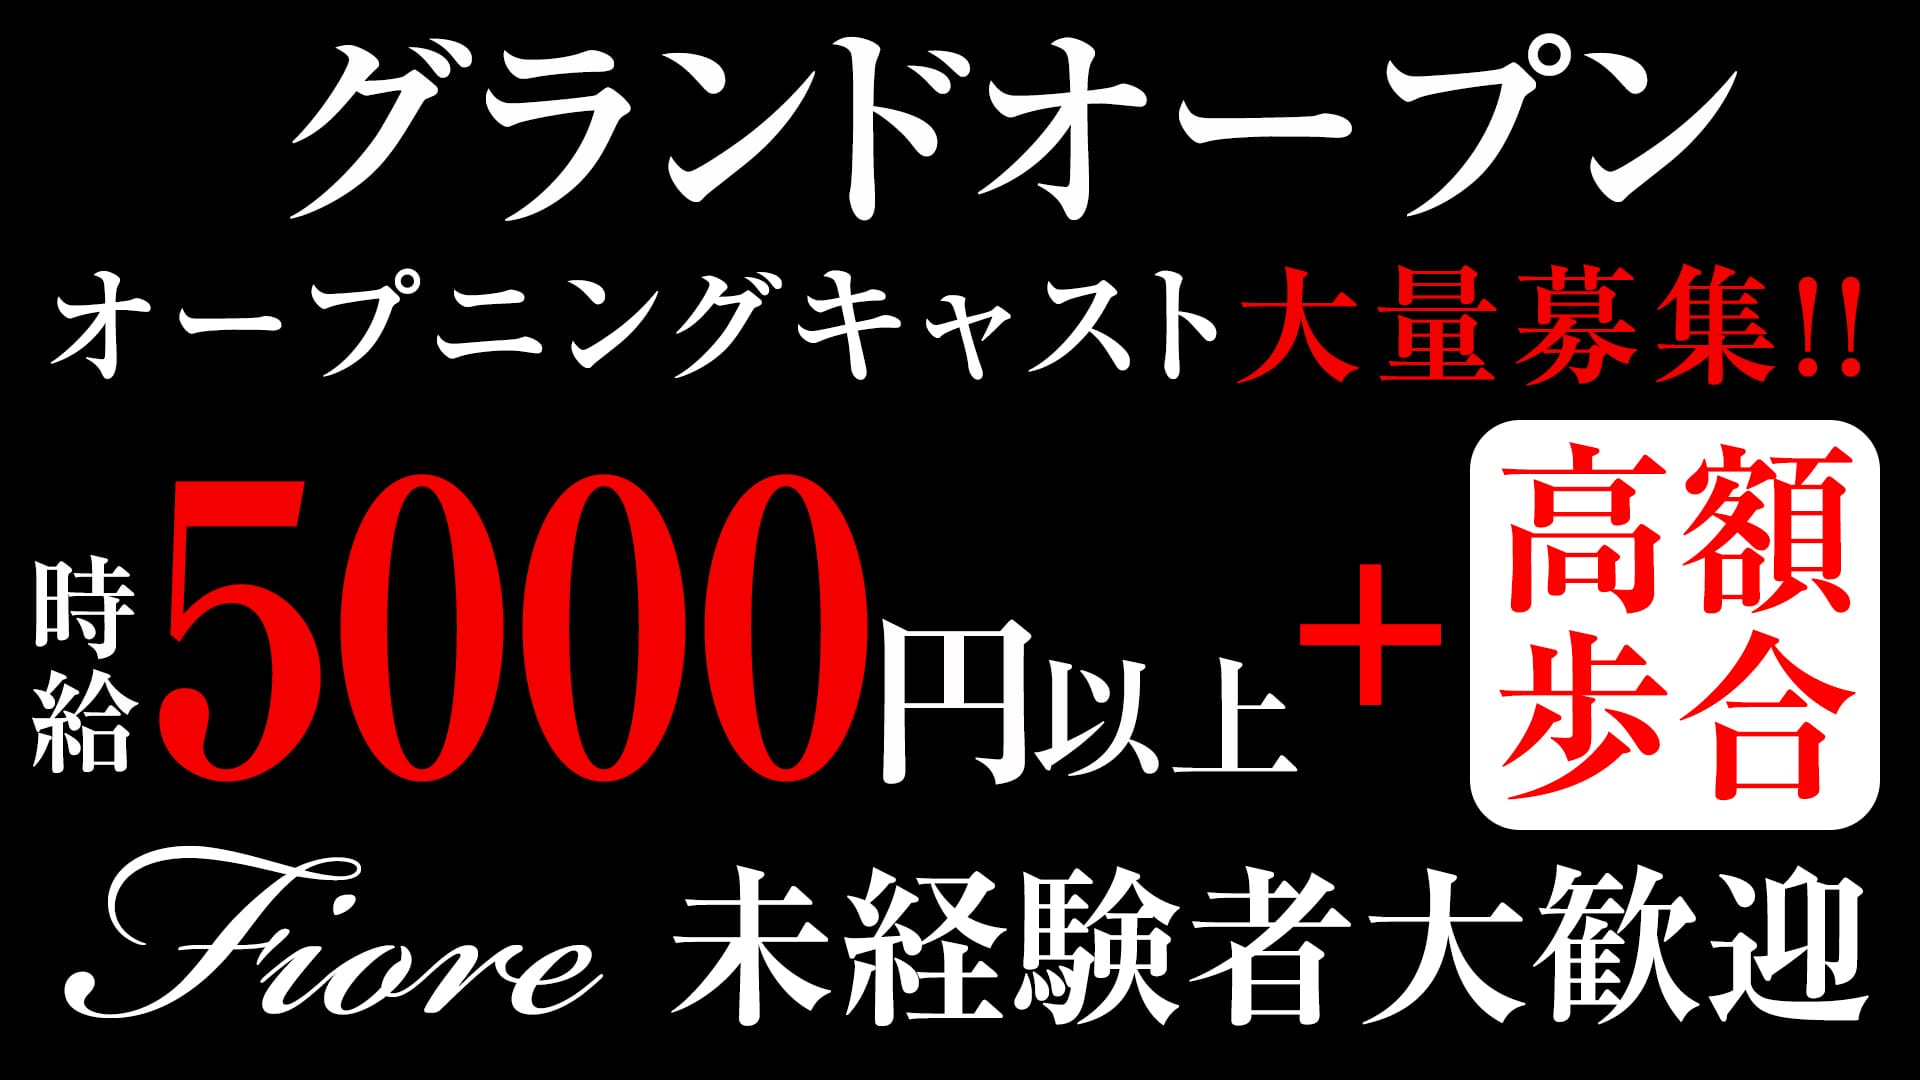 Fiore (フィオーレ) 川崎キャバクラ TOP画像